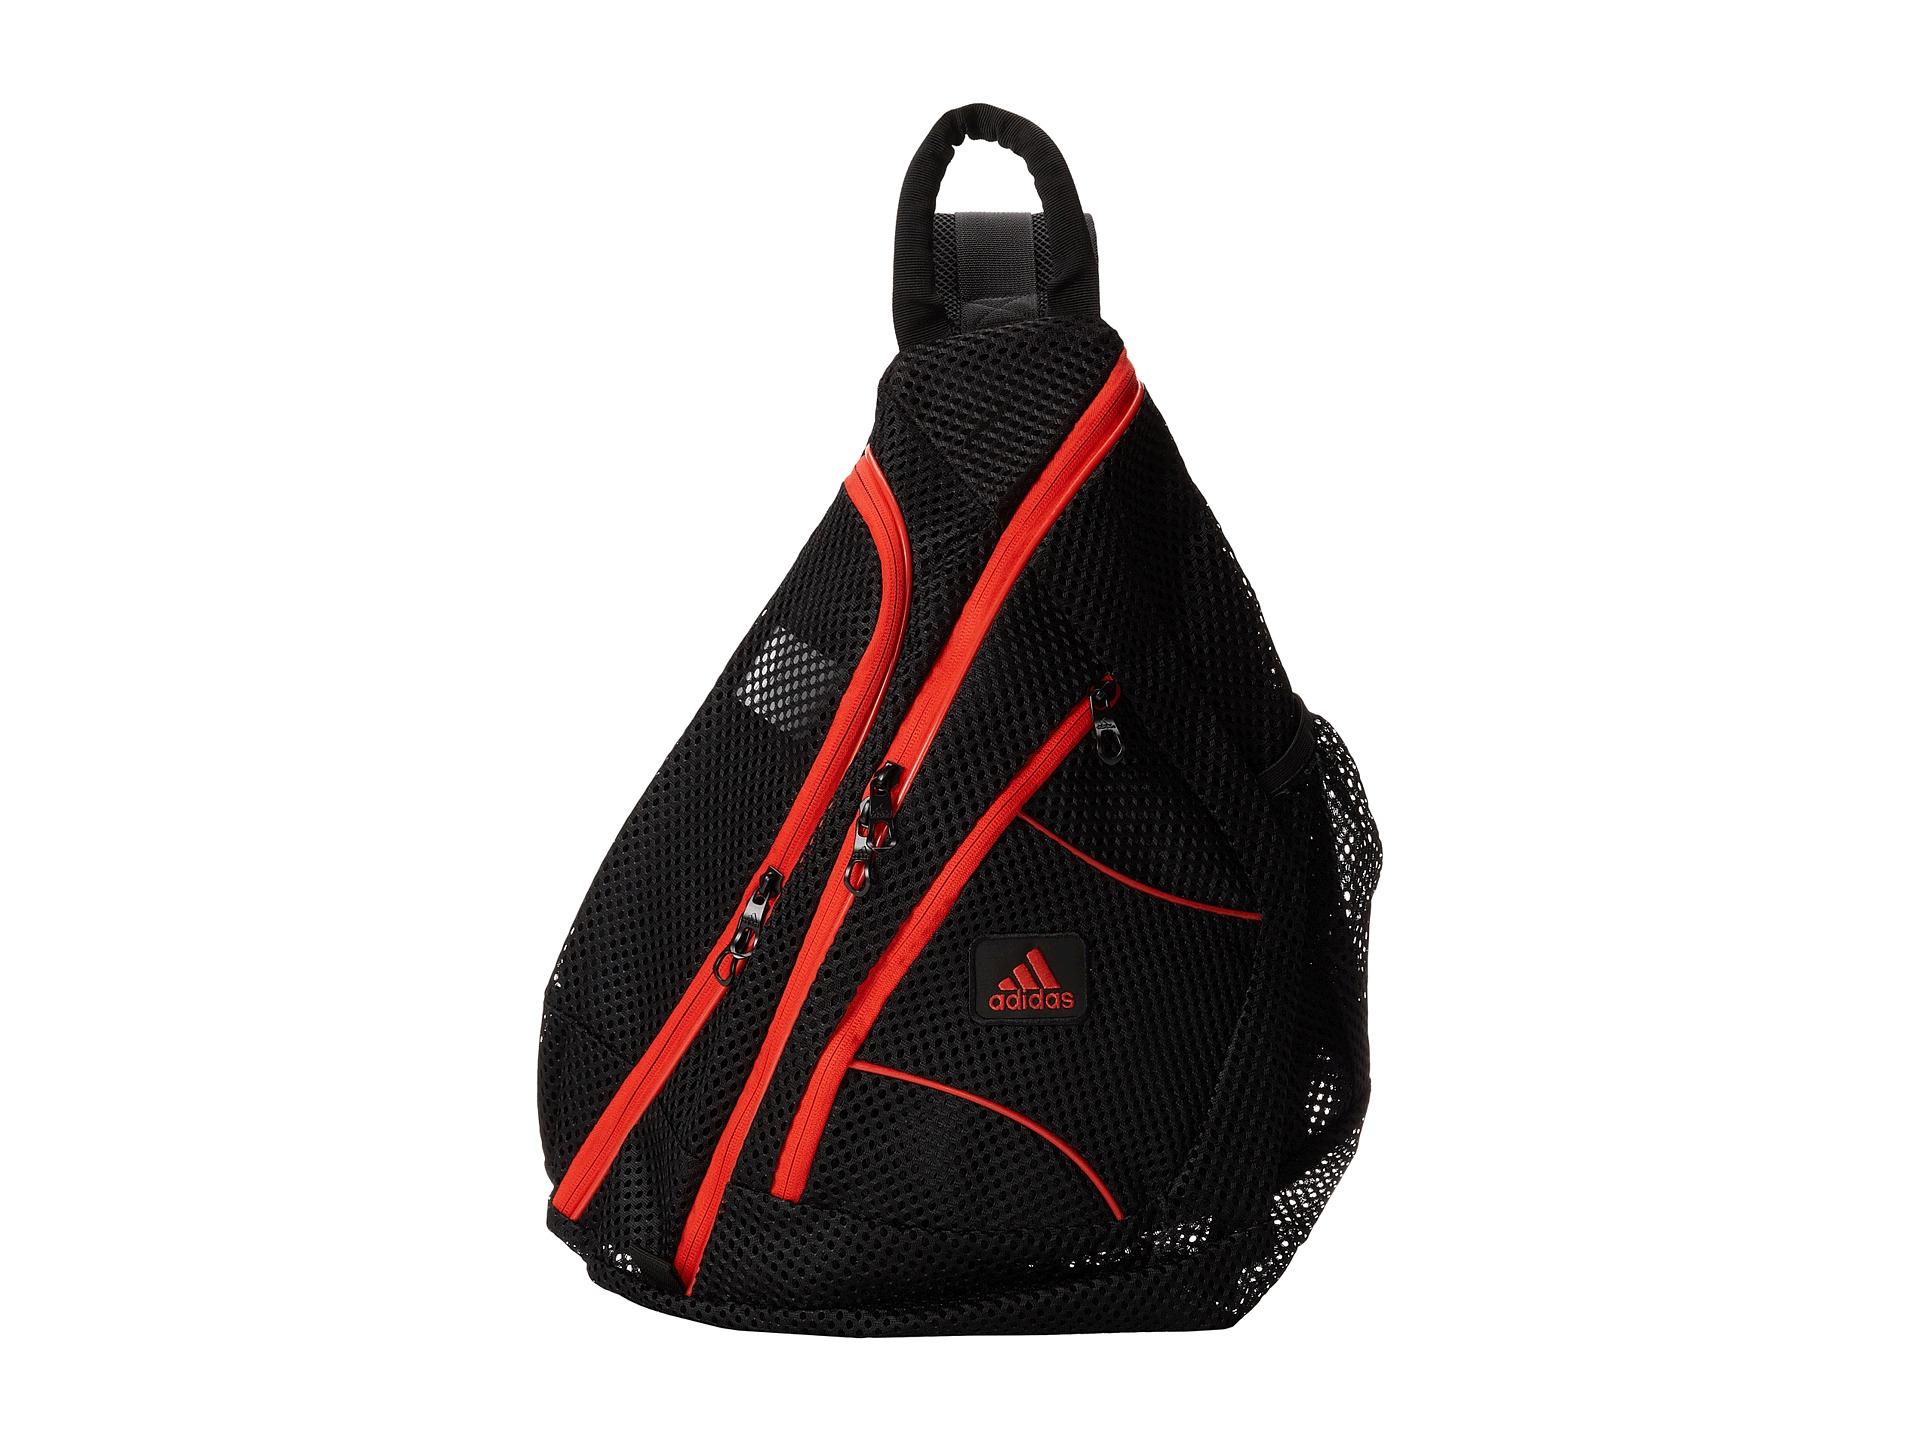 Lyst - adidas Vista Mesh Sling in Black for Men 696e5e54a25bd